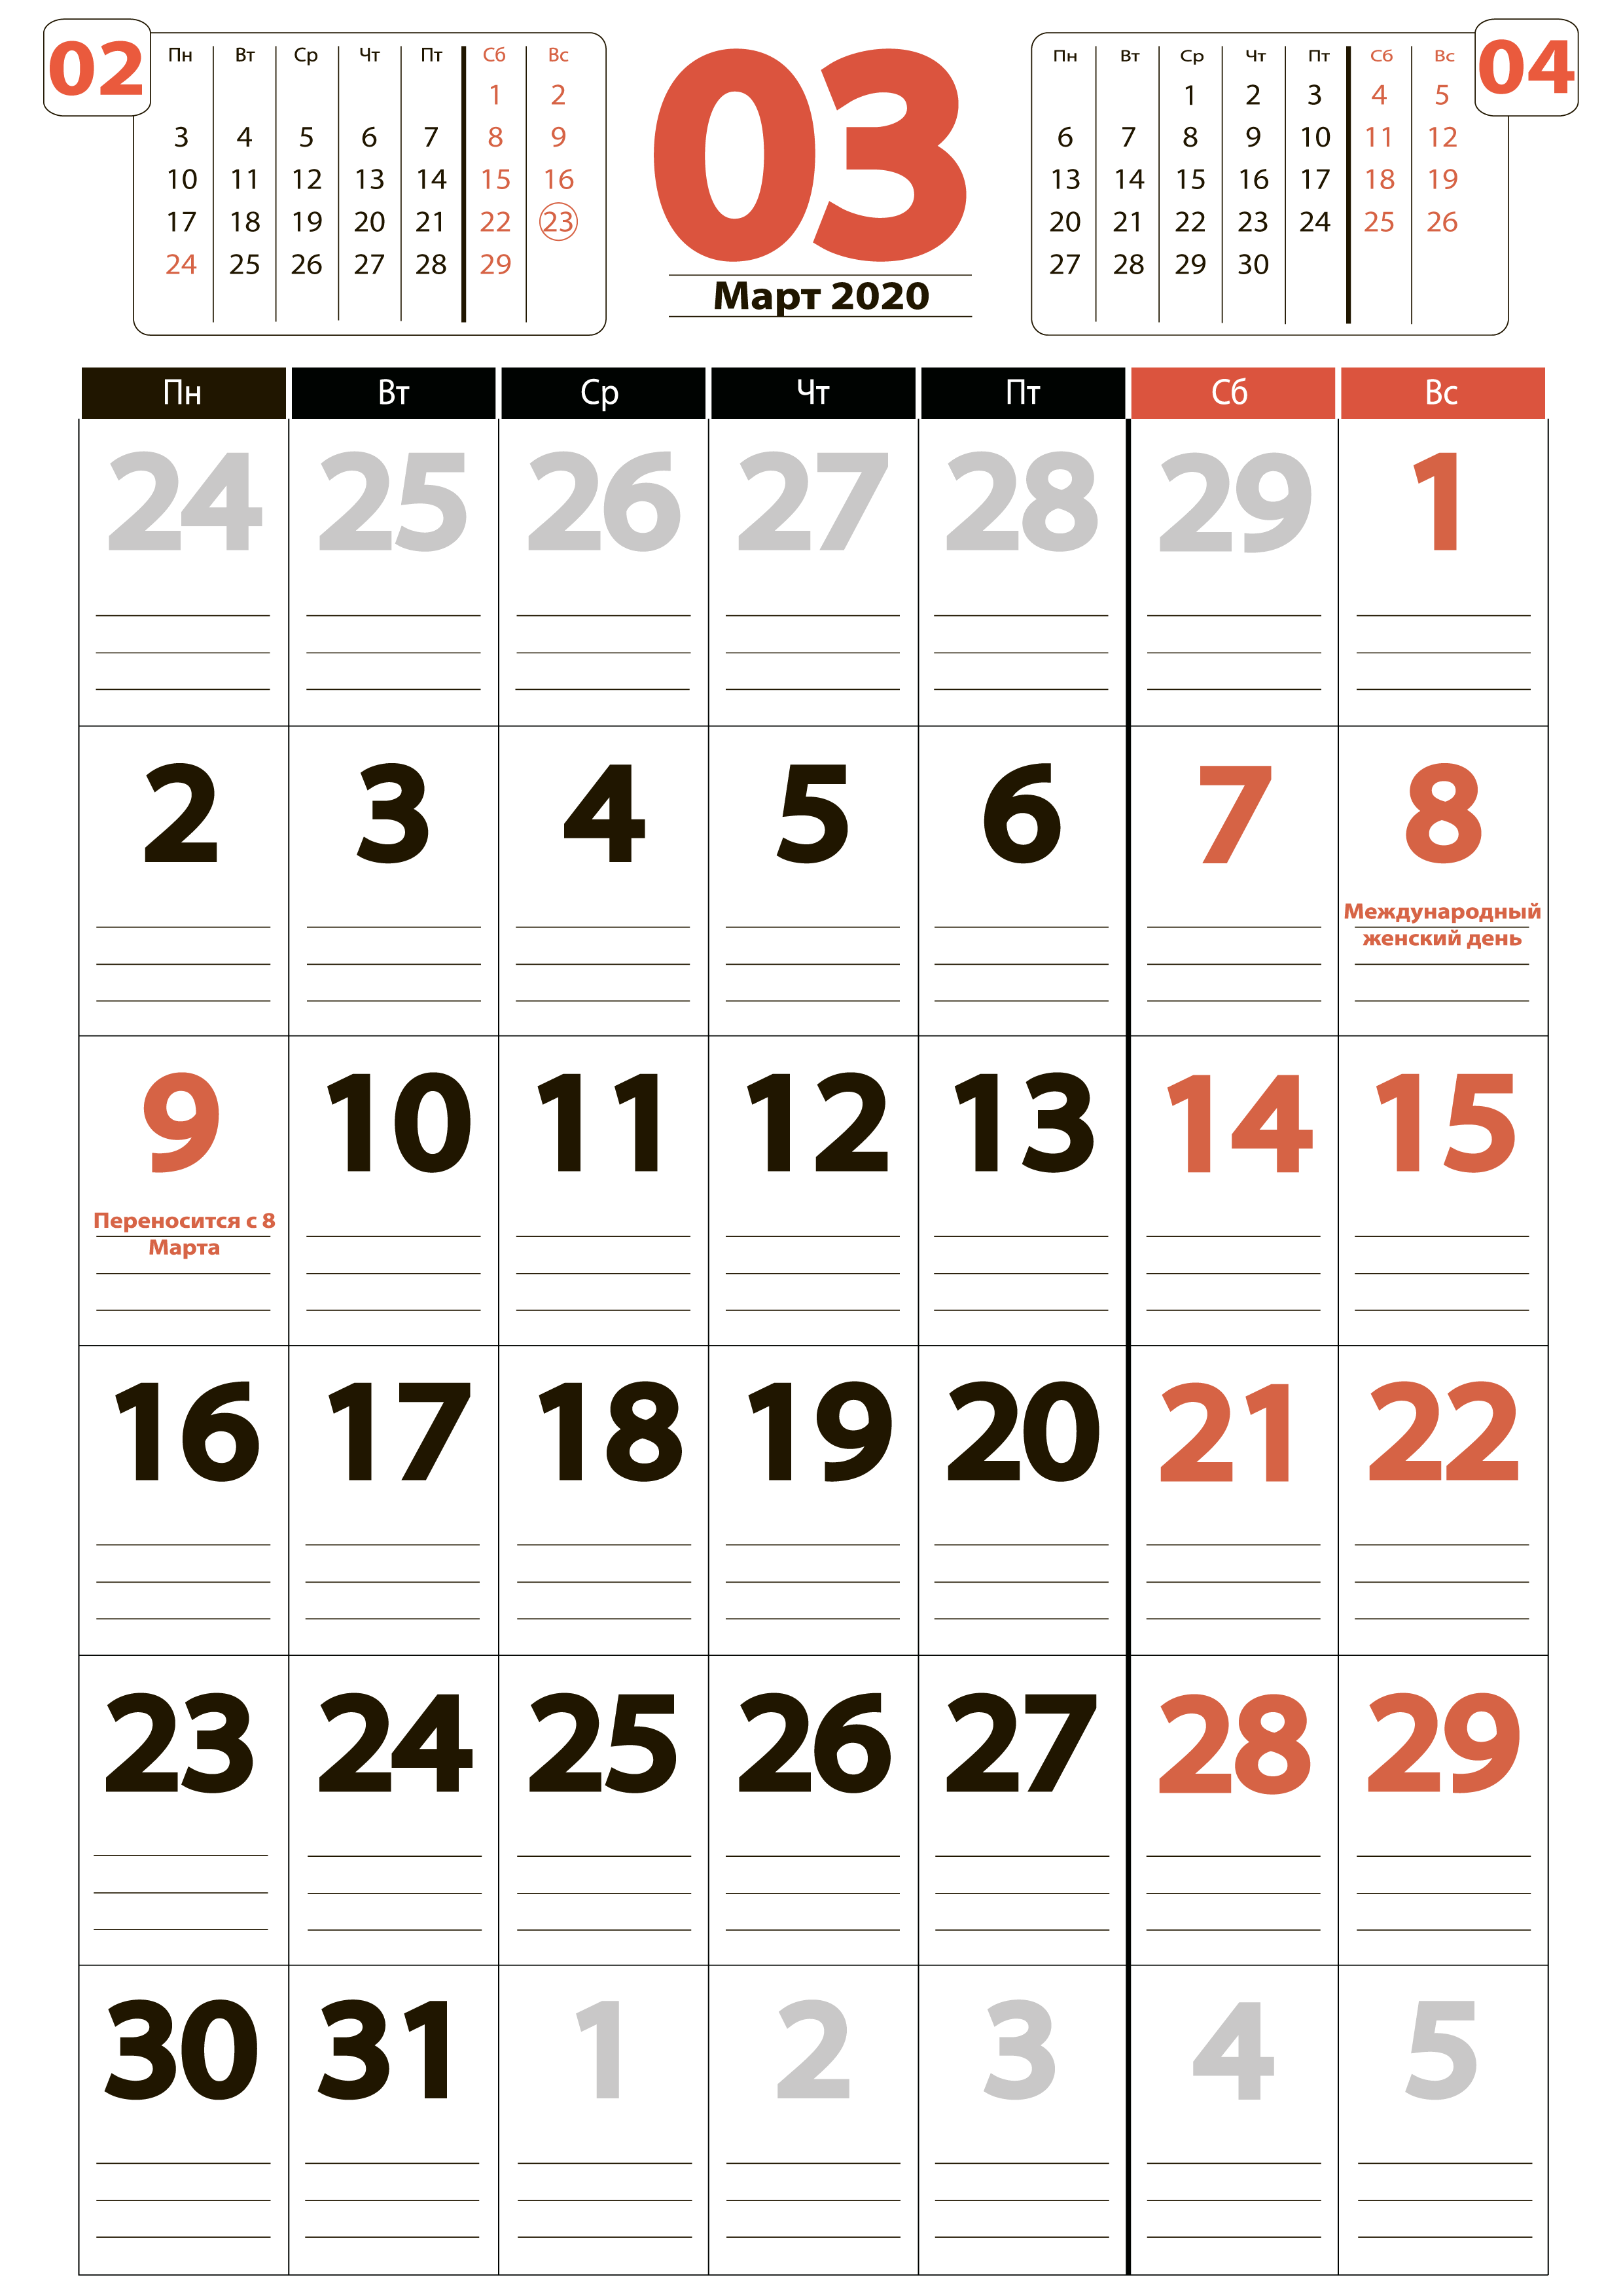 Март 2020 - Крупный календарь на месяц